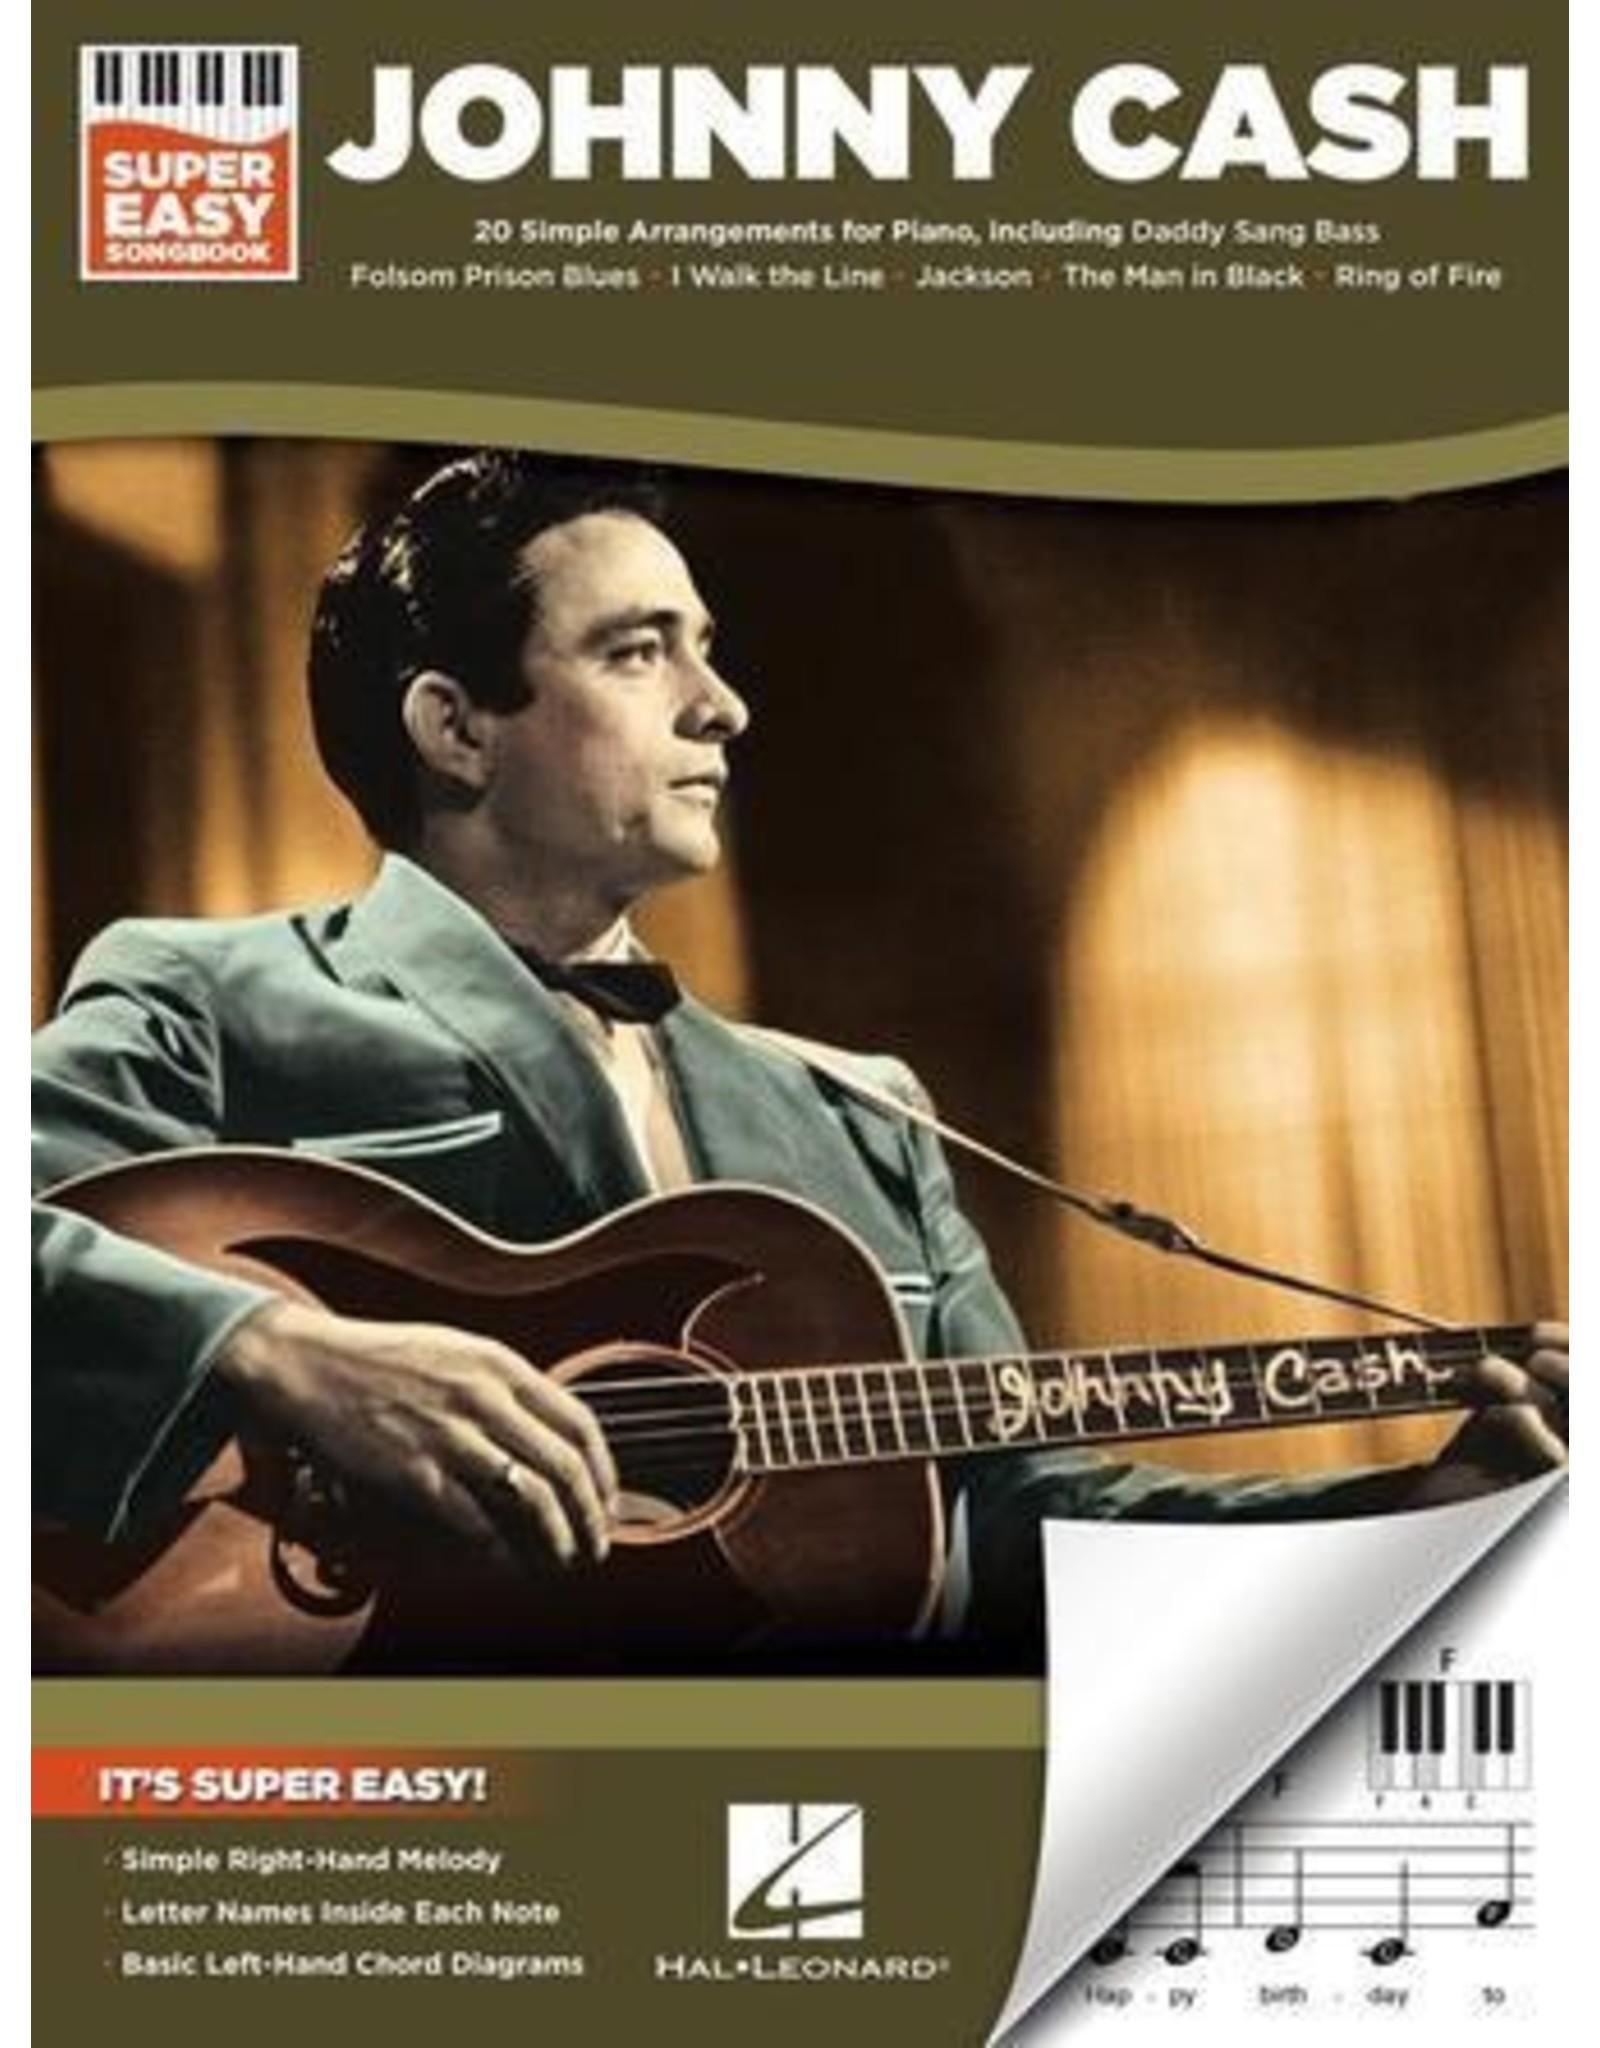 Hal Leonard Johnny Cash Super Easy Songbook